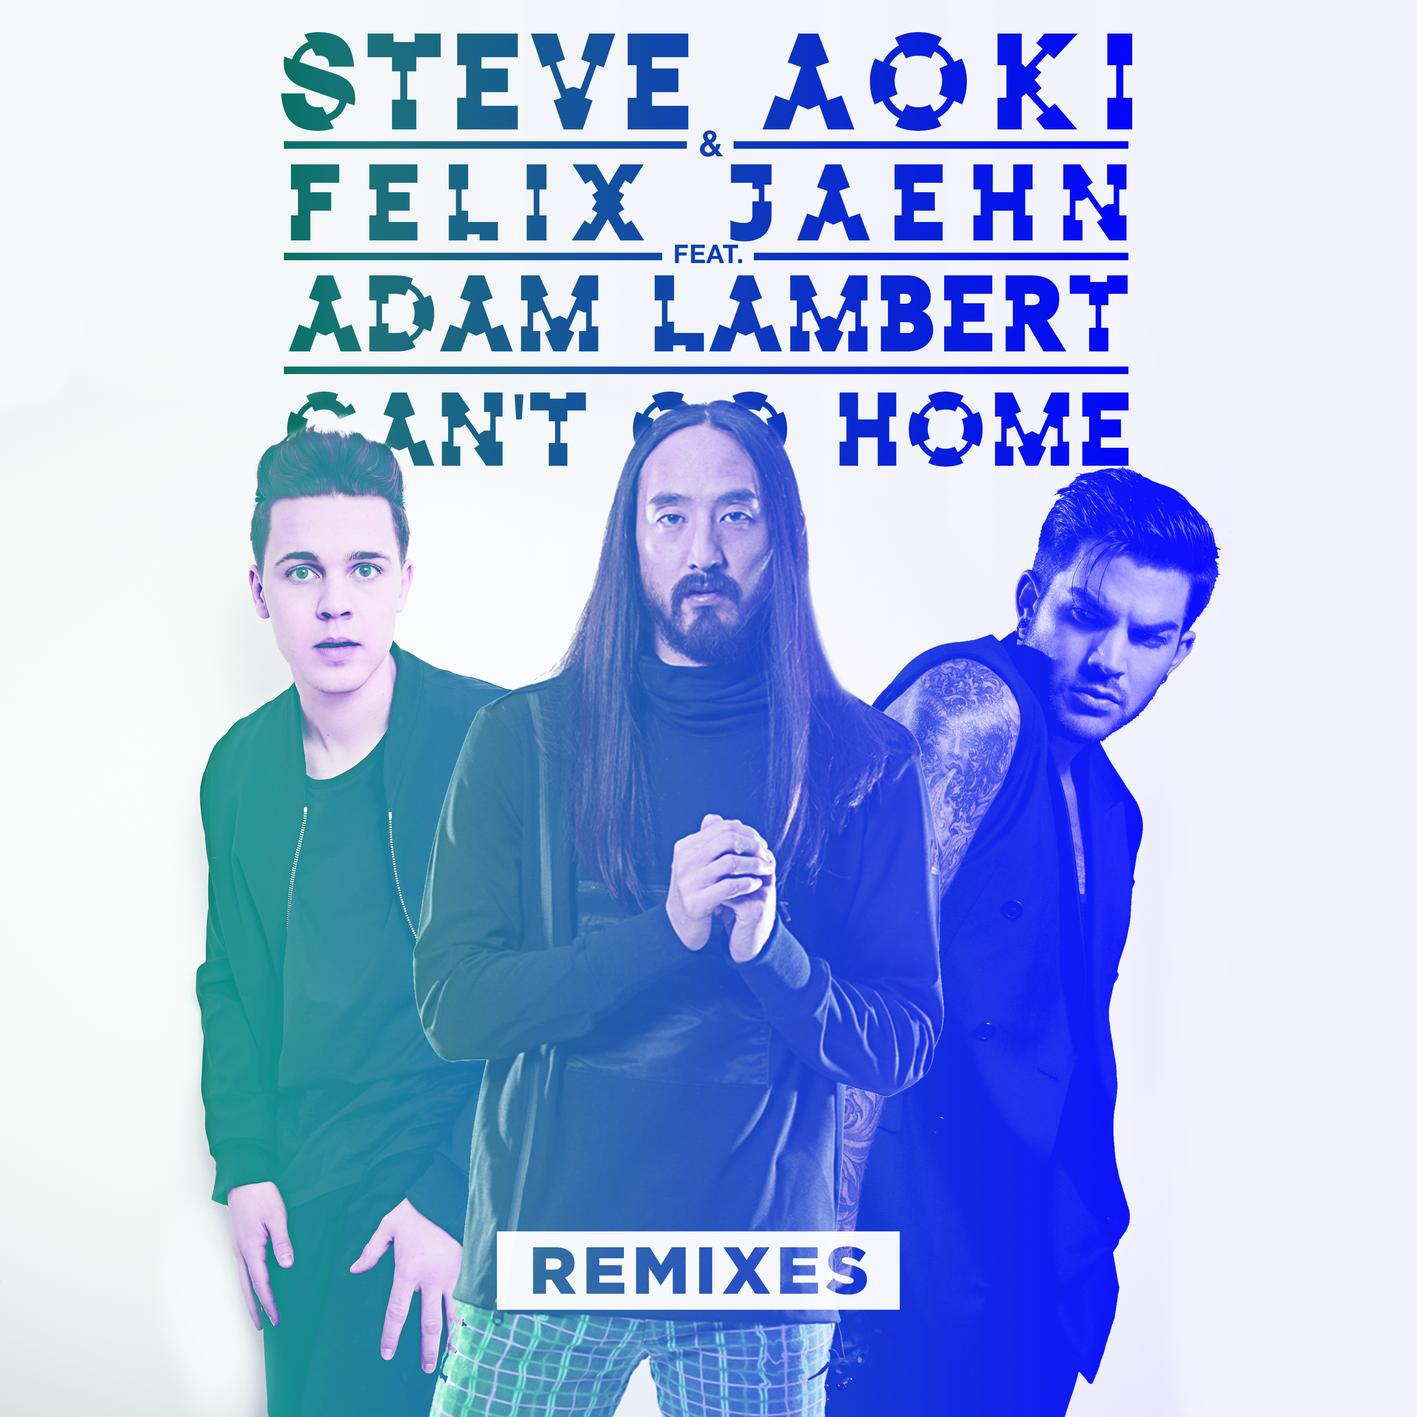 Steve Aoki & Felix Jaehn Ft. Adam Lambert - Can't Go Home Remixes [ULTRA RECORDS] UL8086